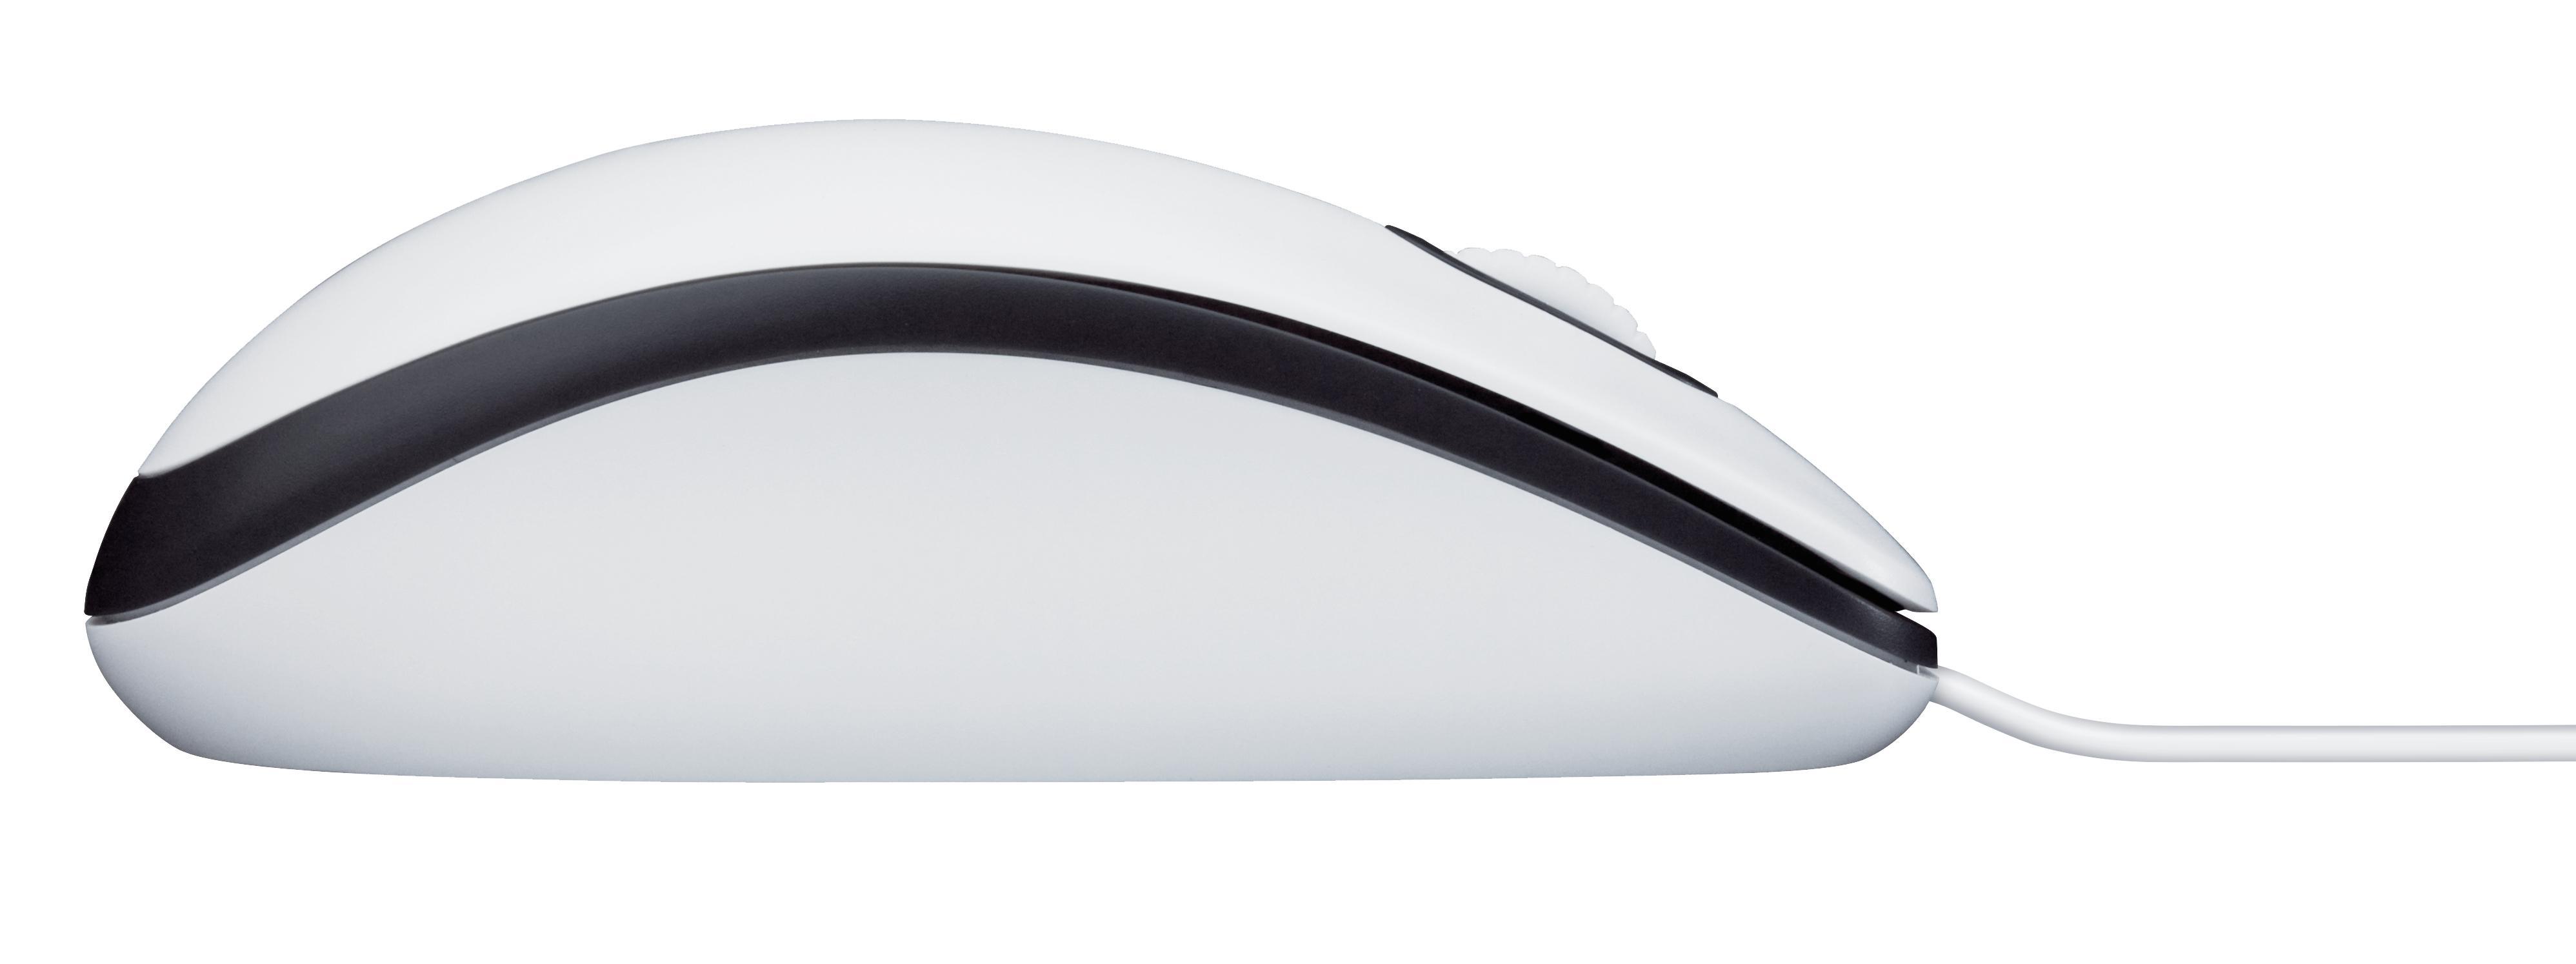 faec414bf59 LOGITECH M100 USB Optique 1000DPI Ambidextre Blanc souris - Souris ...